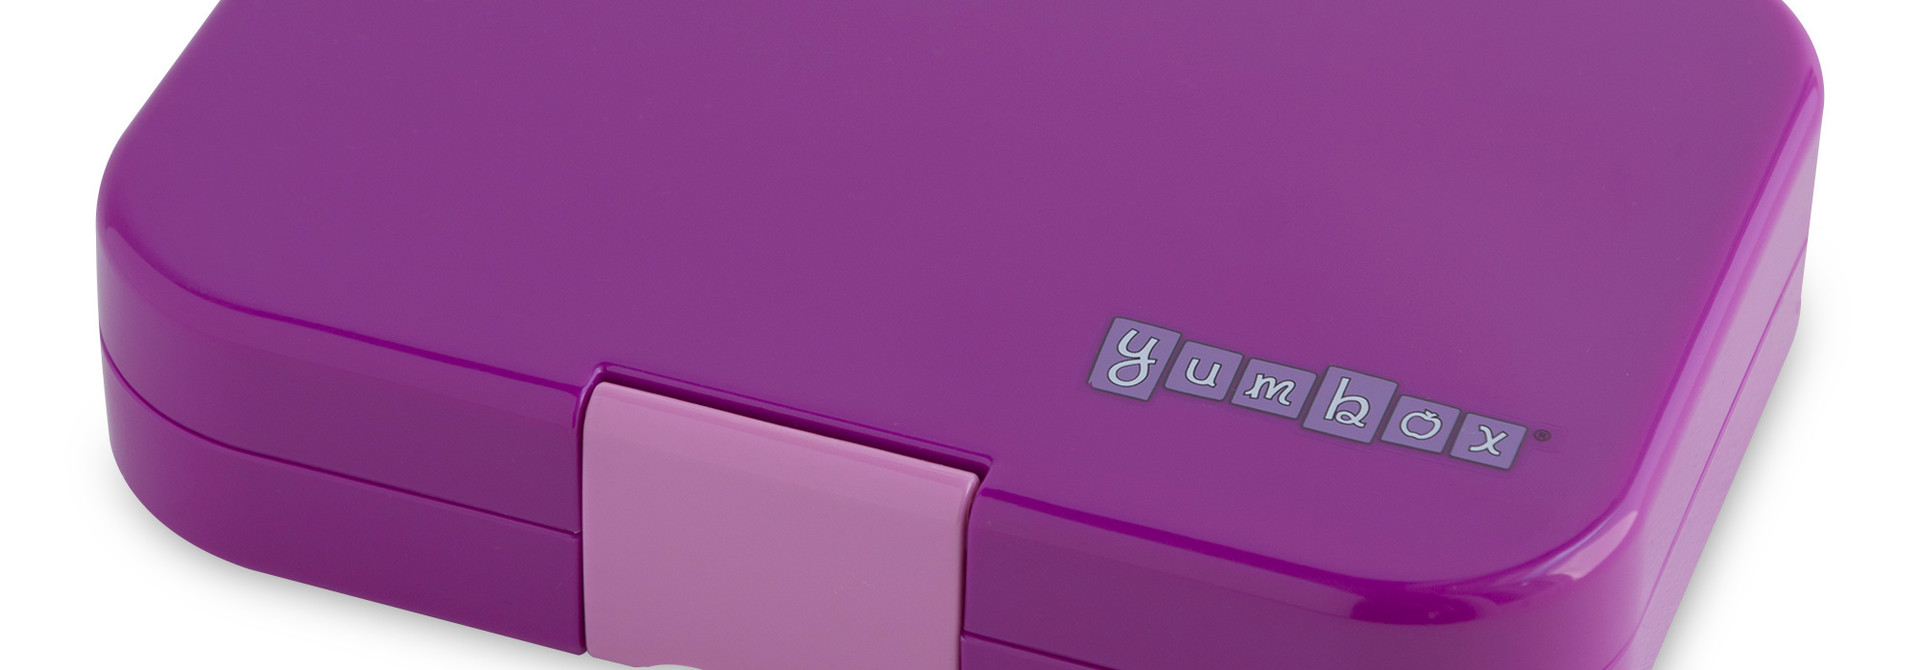 Yumbox Original exterior box Bijoux Purple